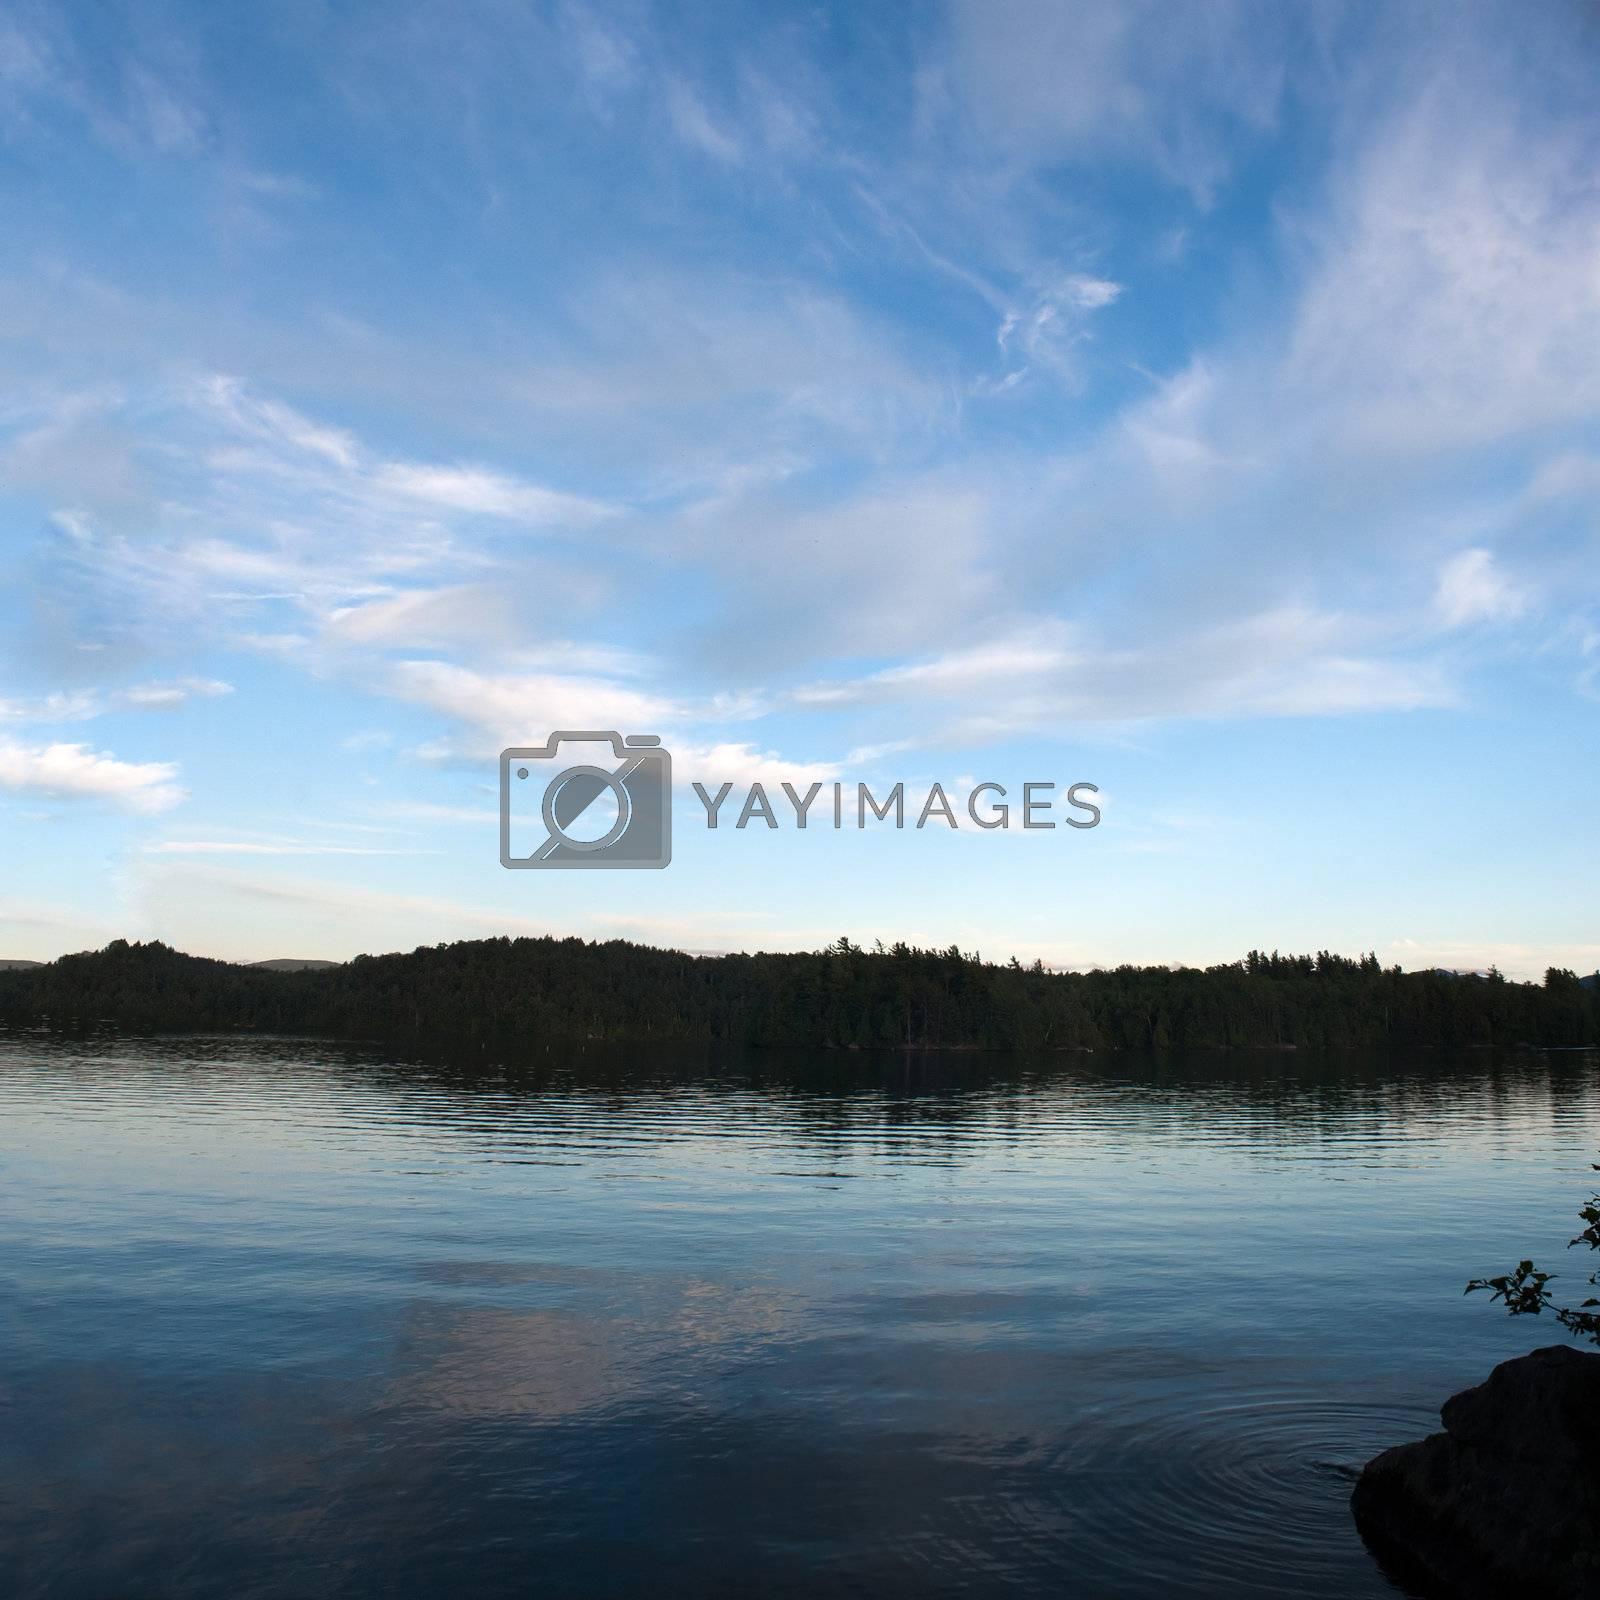 A view of lower Saranac Lake and islands located in the upstate New York Adirondacks around dusk.